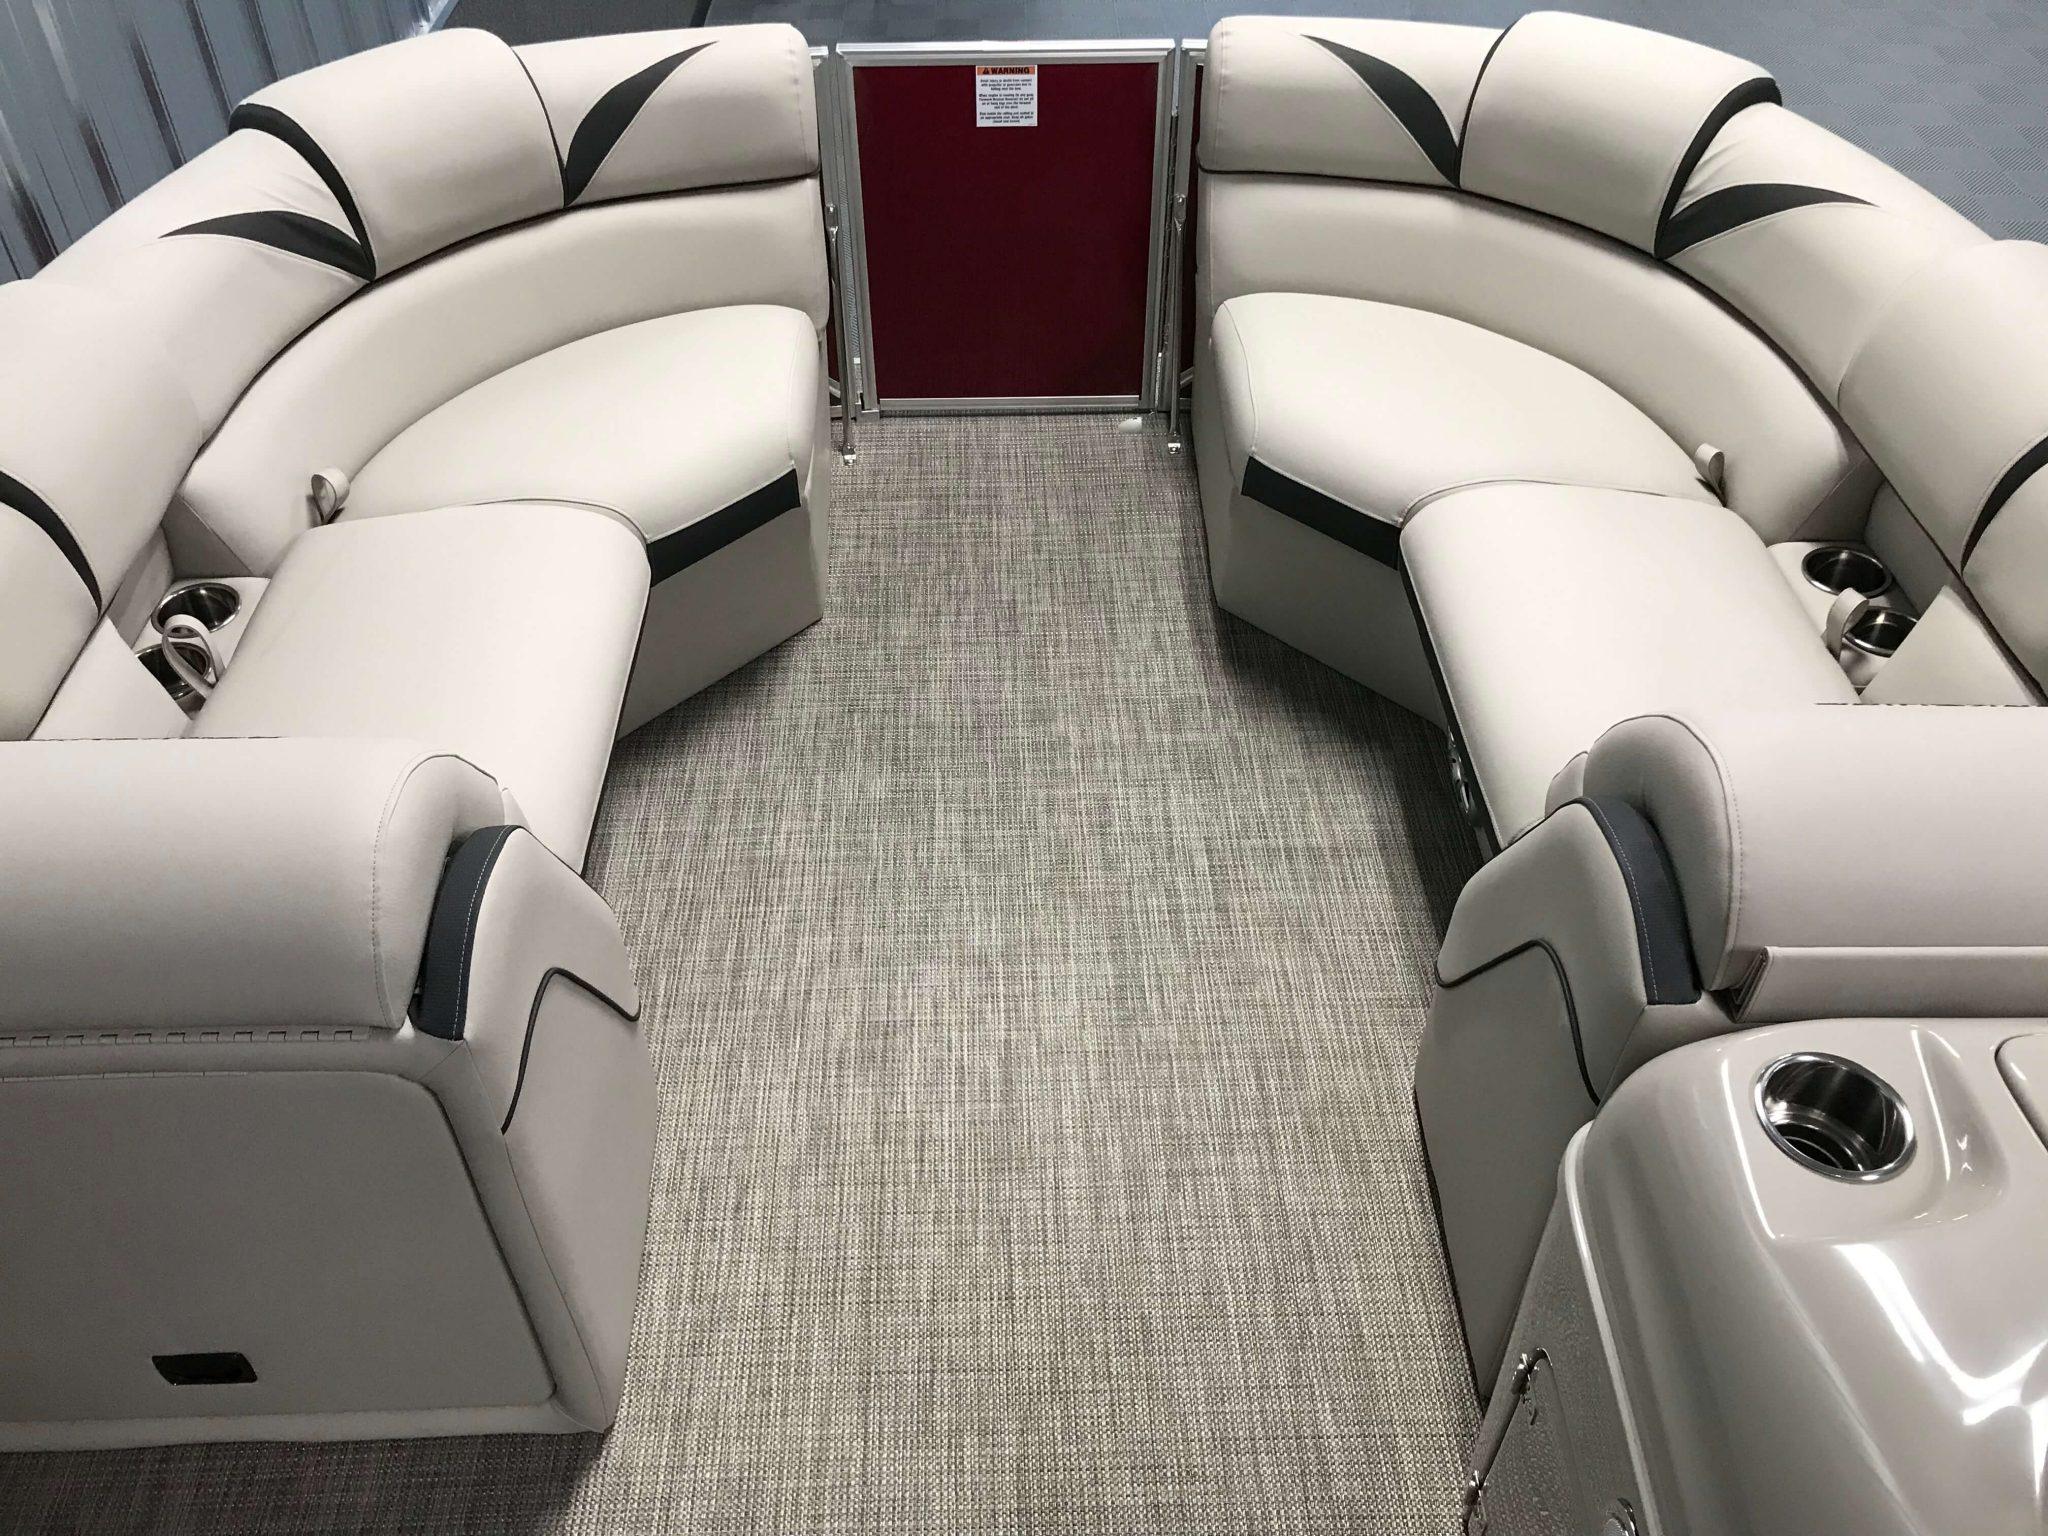 2019 Berkshire 23RFX STS Deluxe Interior Cockpit Layout 4